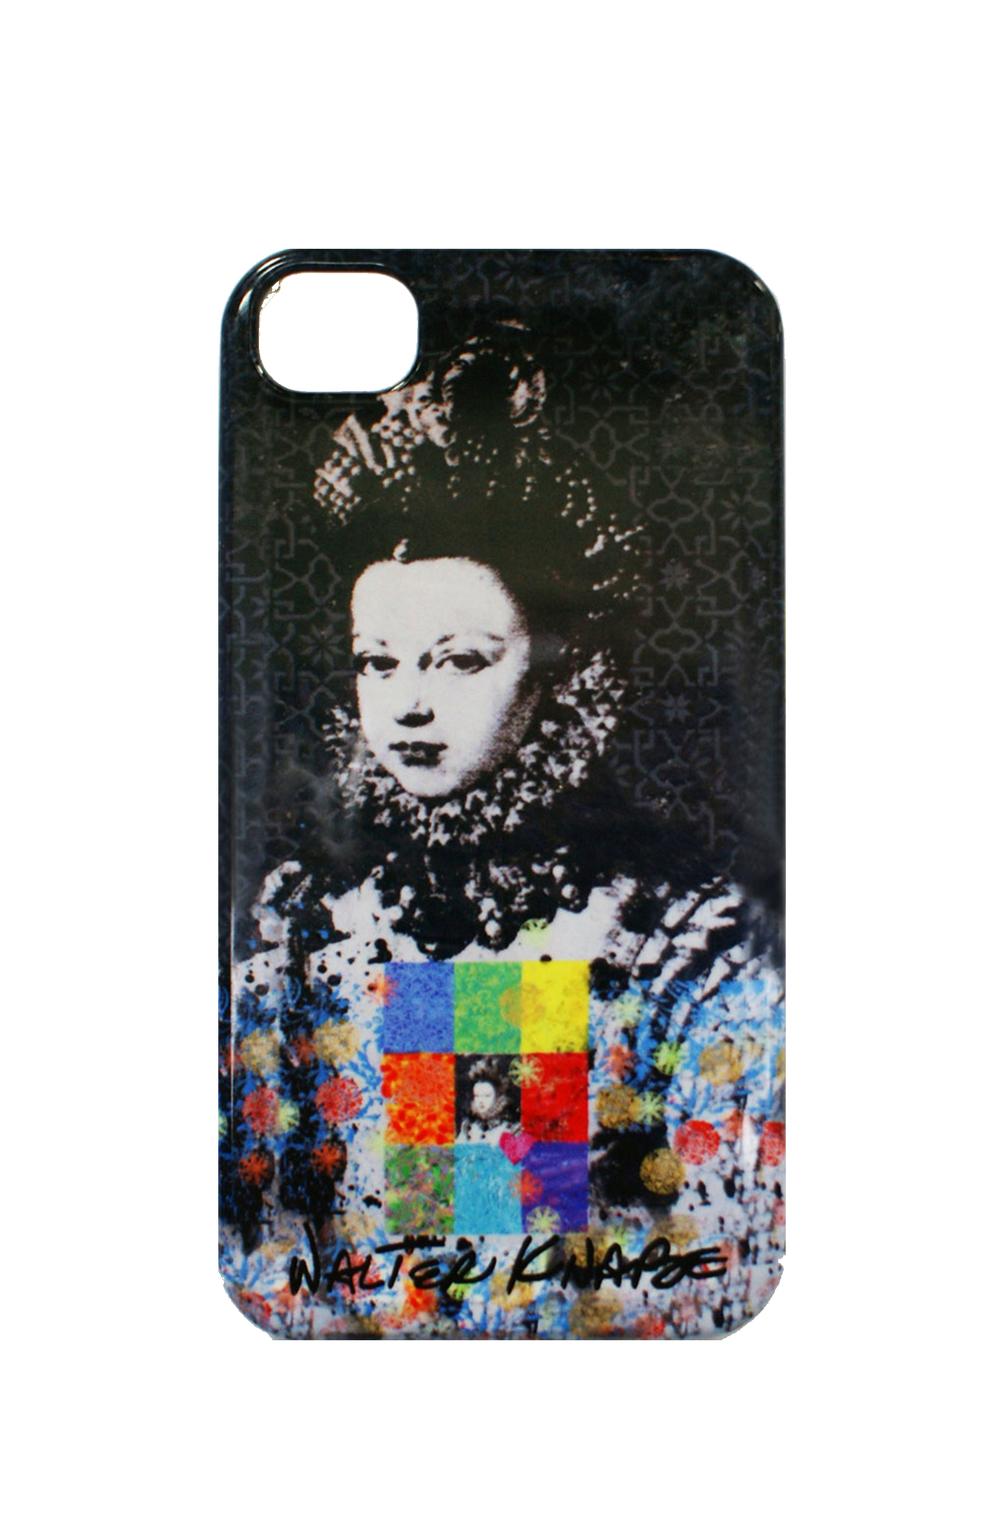 Isbella-phone-case.jpg